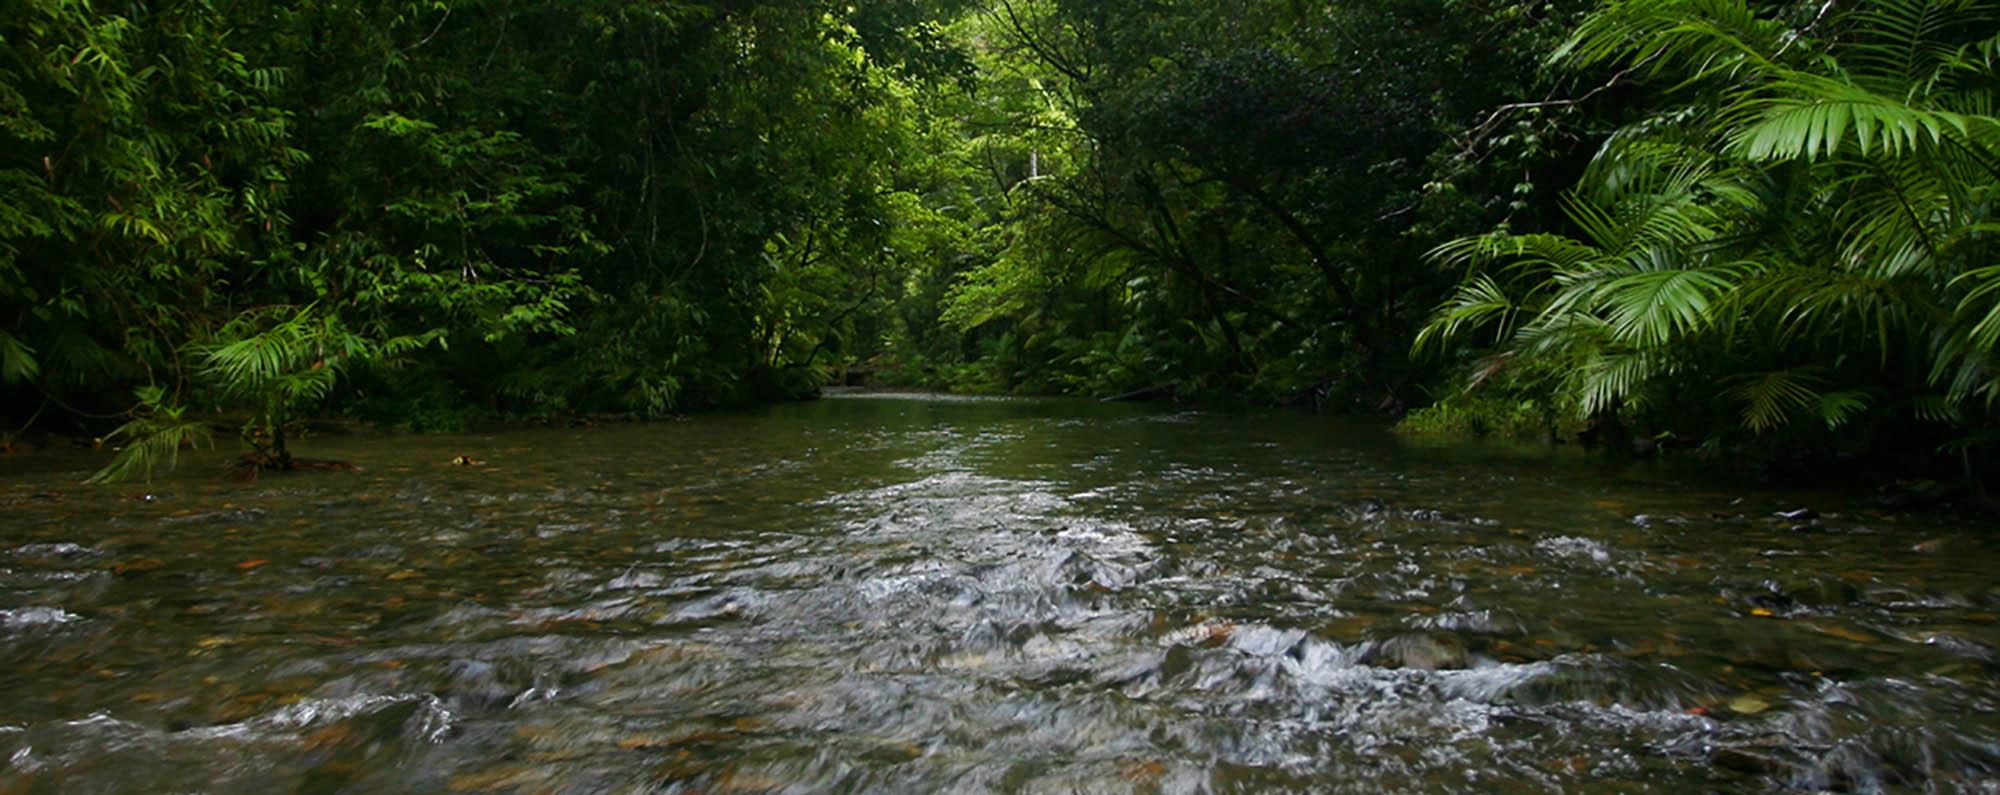 Daintree Rainforest Foundation Ltd Constitution